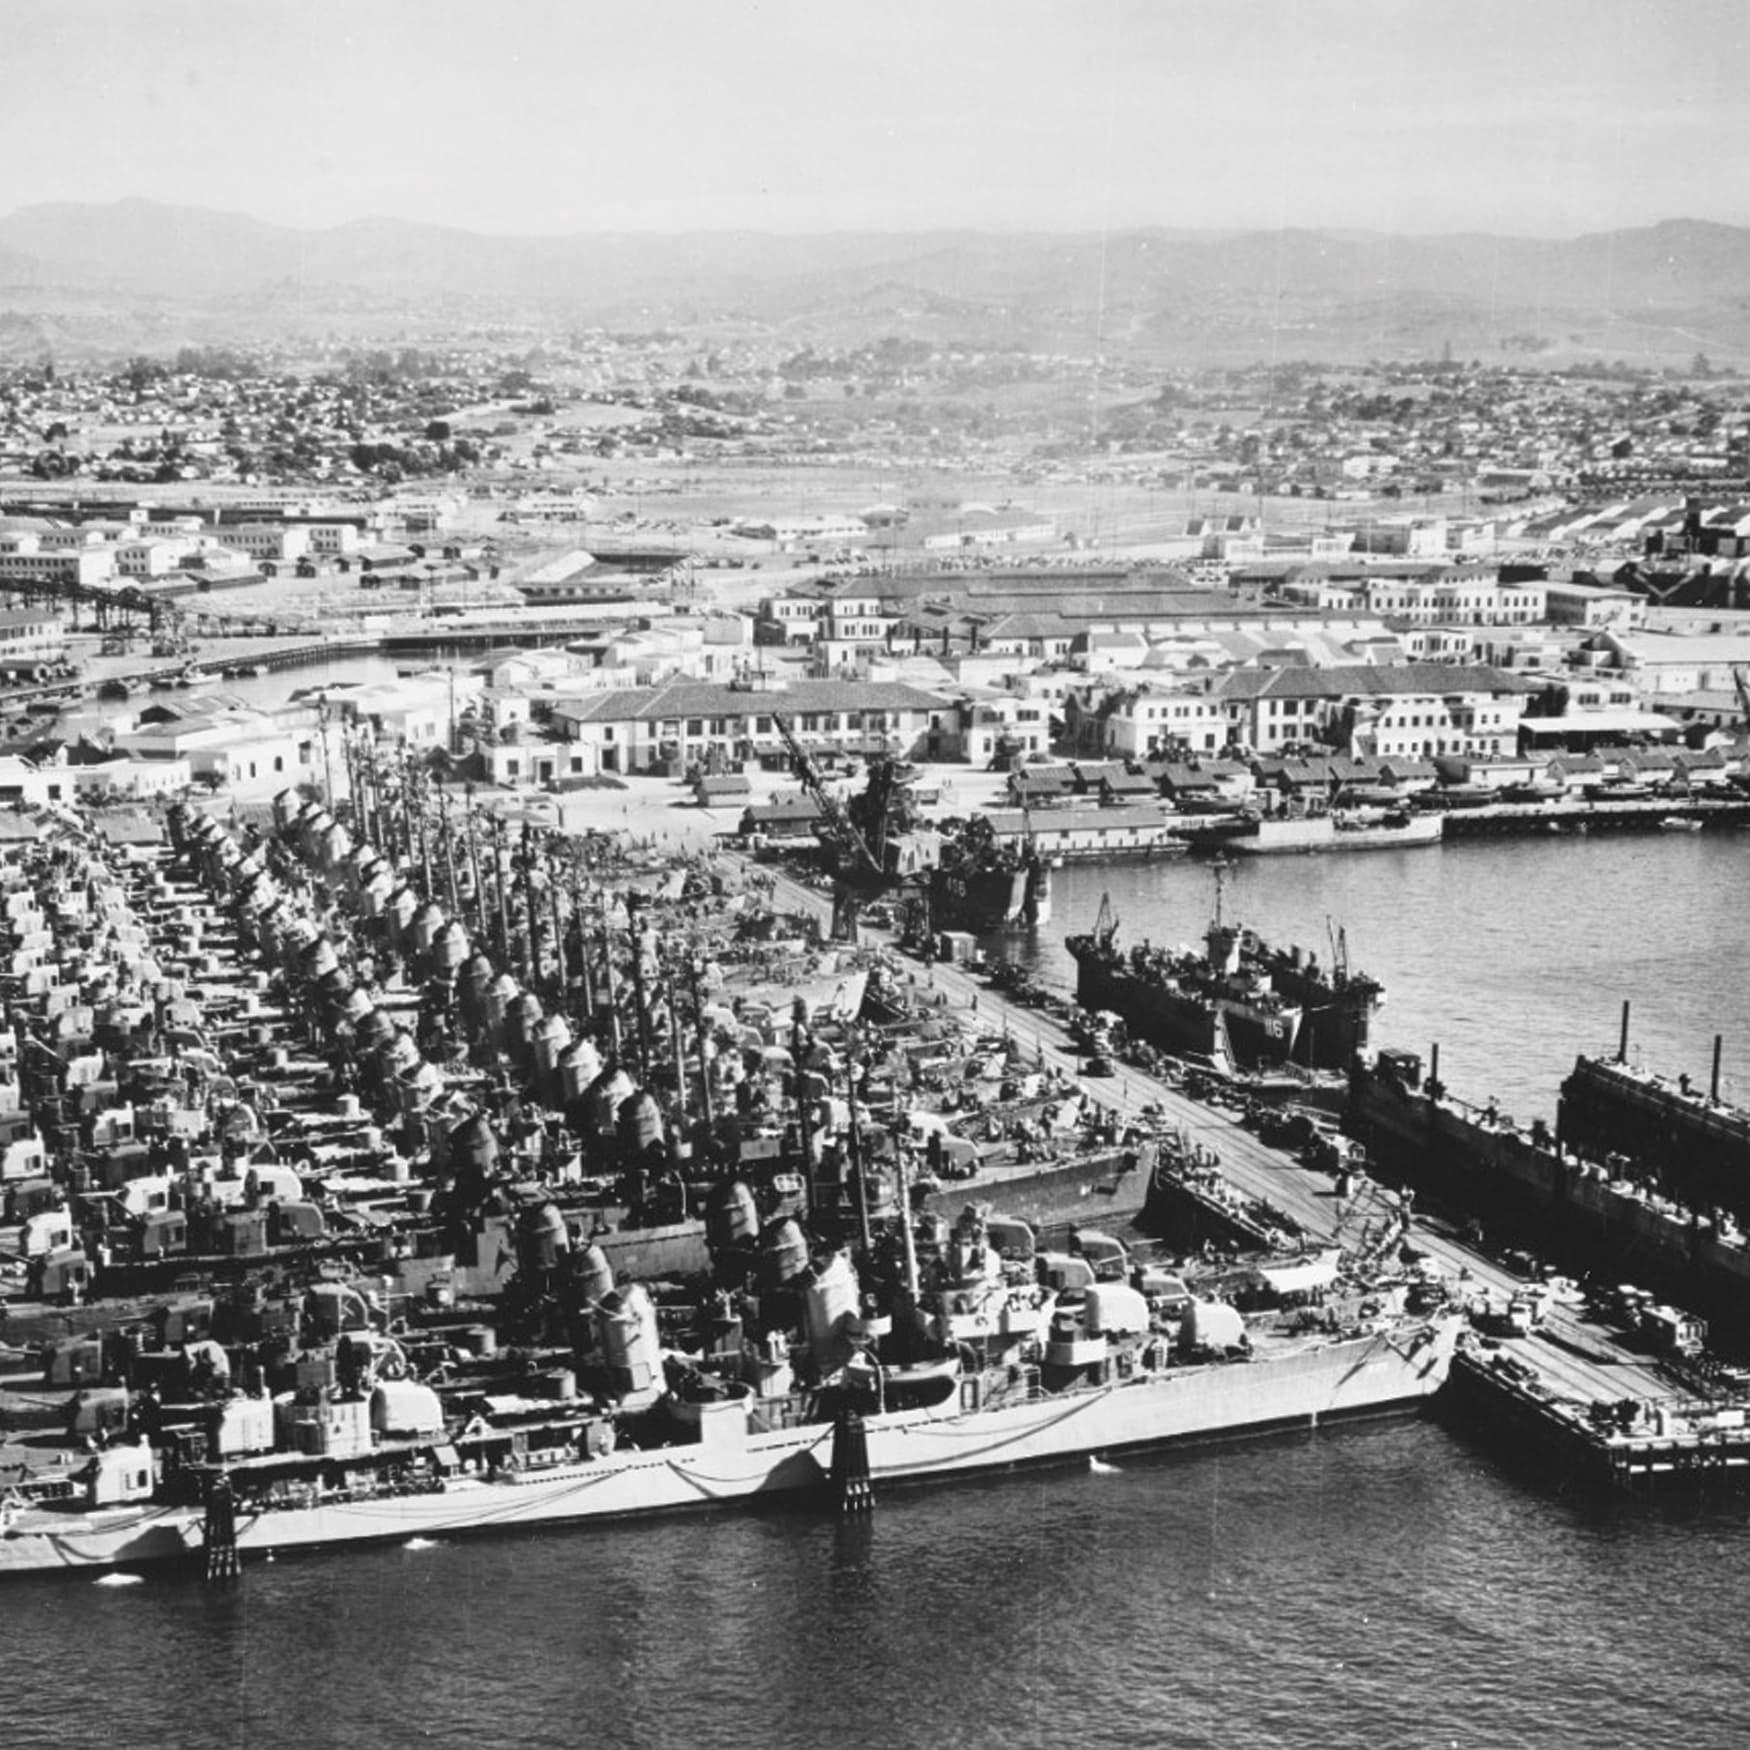 Port of San Diego Historic Photo